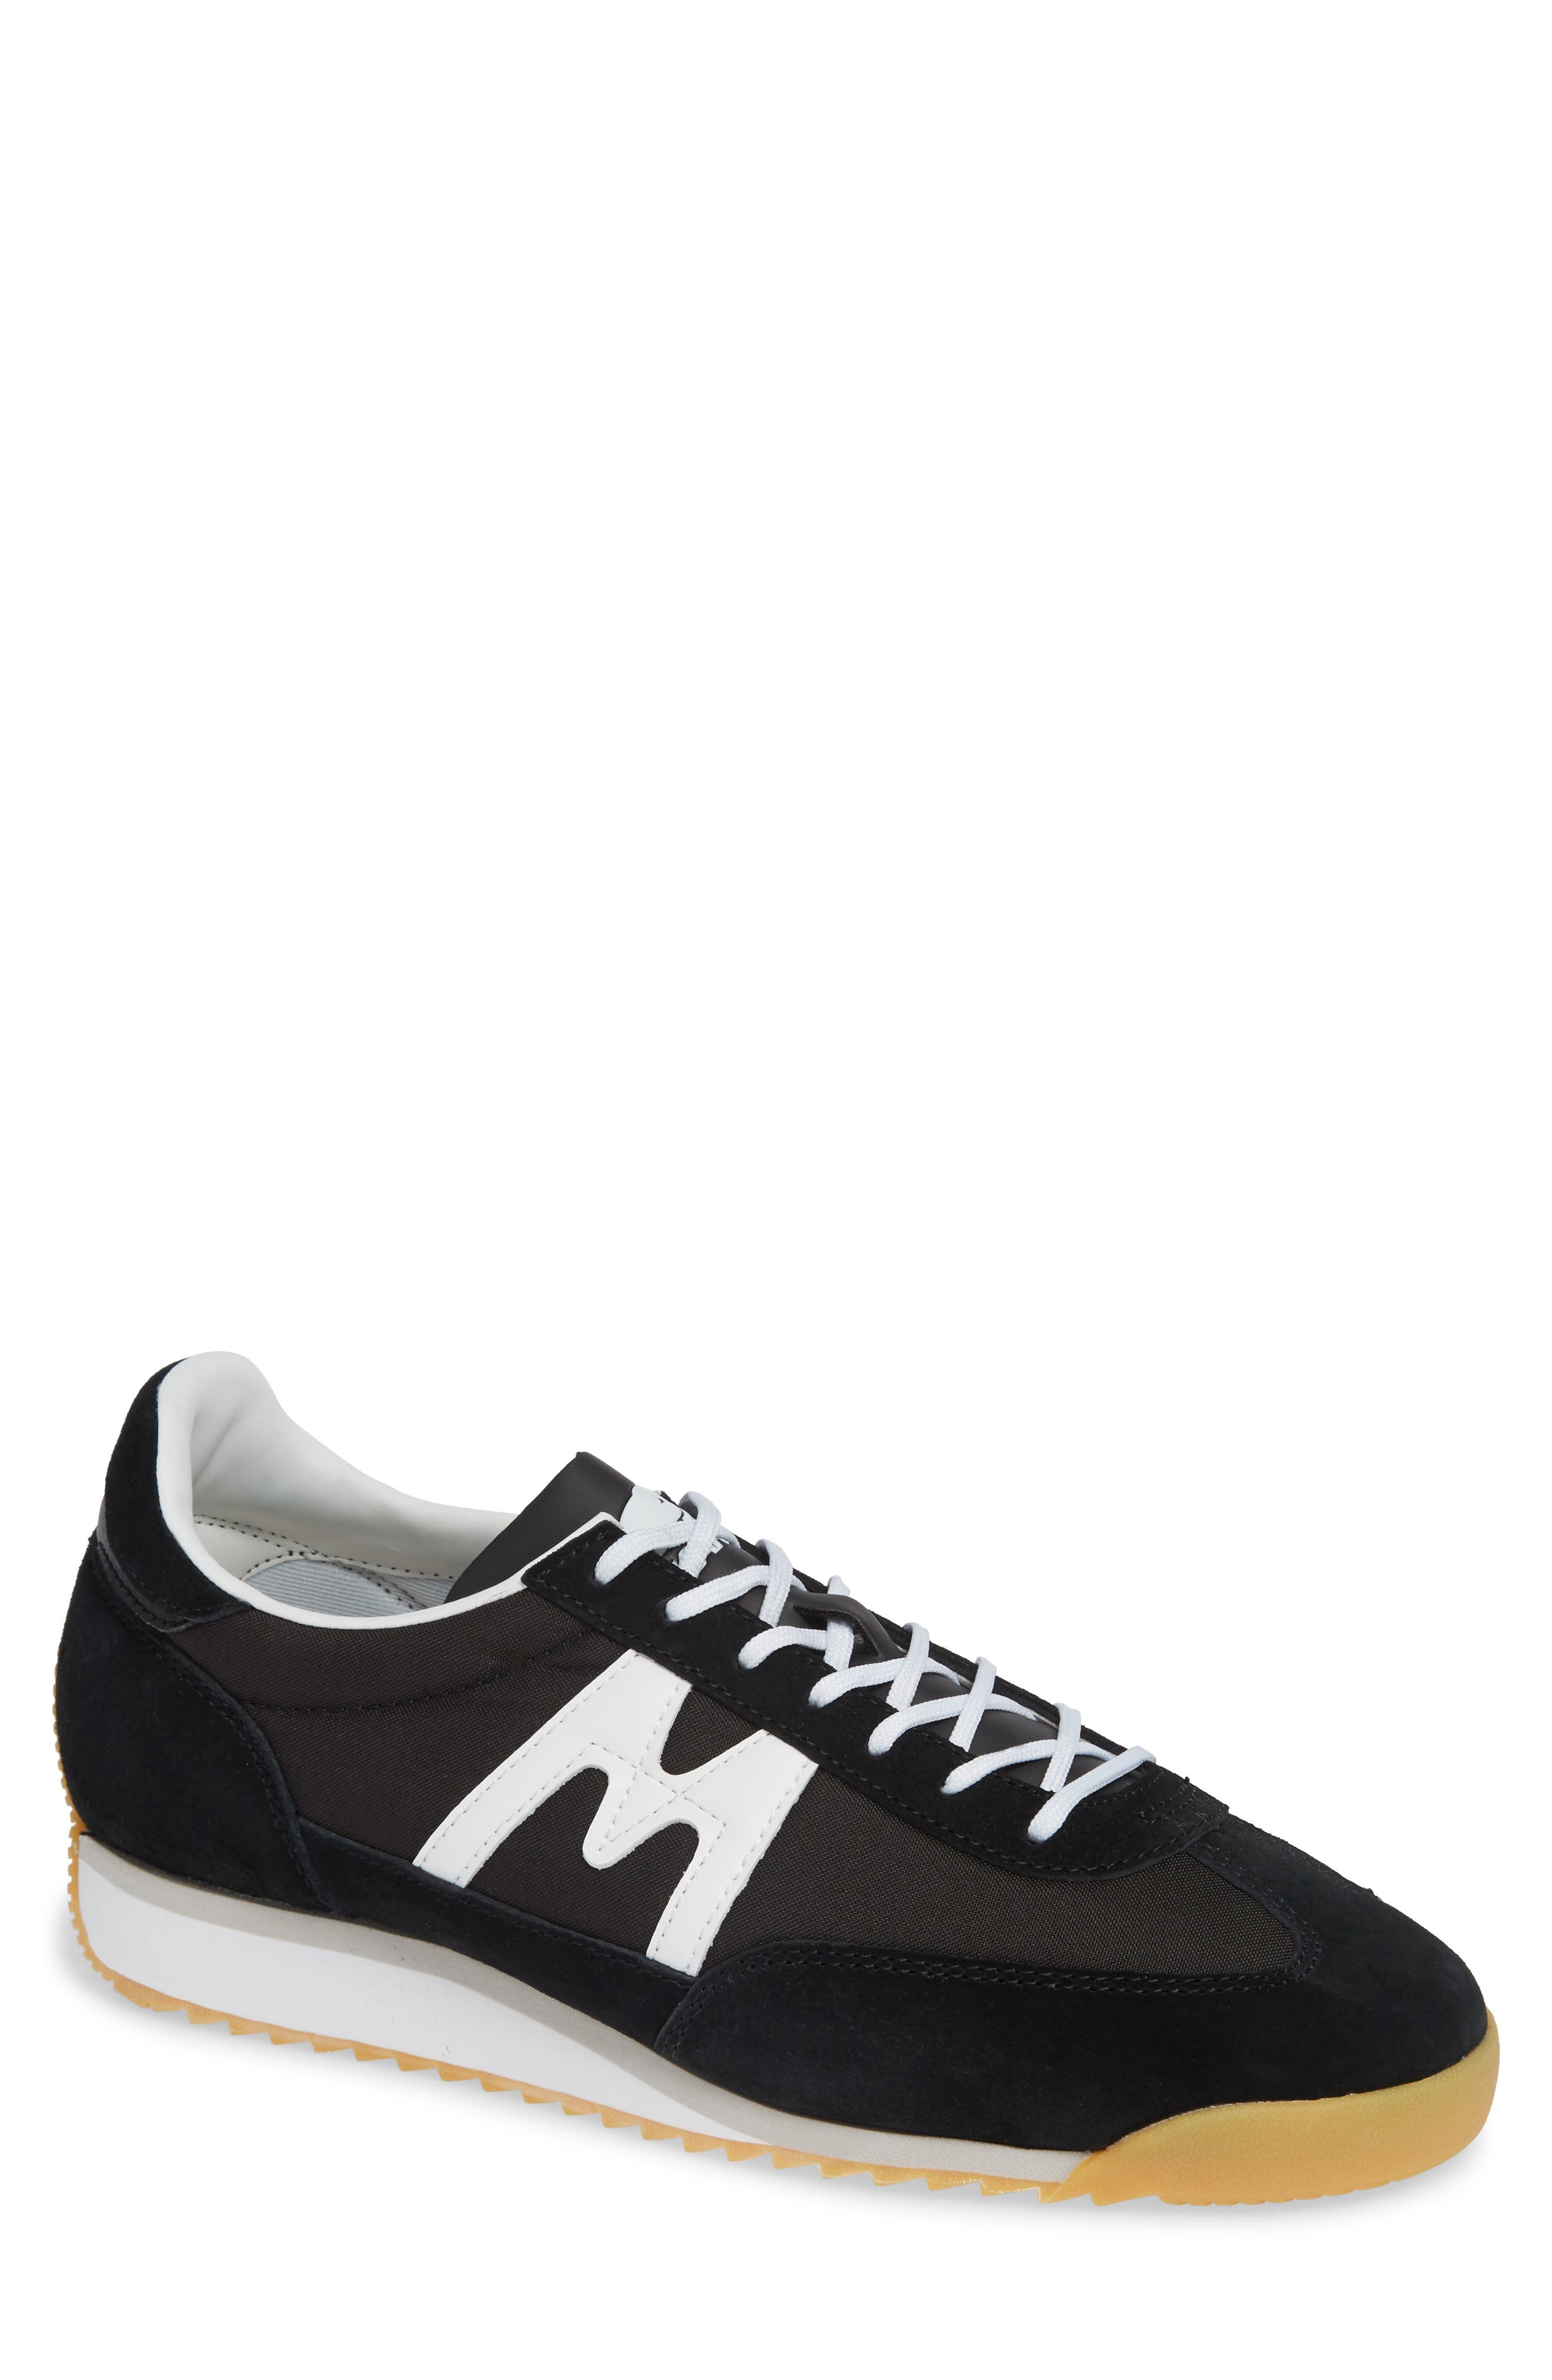 Championair Sneaker,                         Main,                         color, BLACK/ WHITE